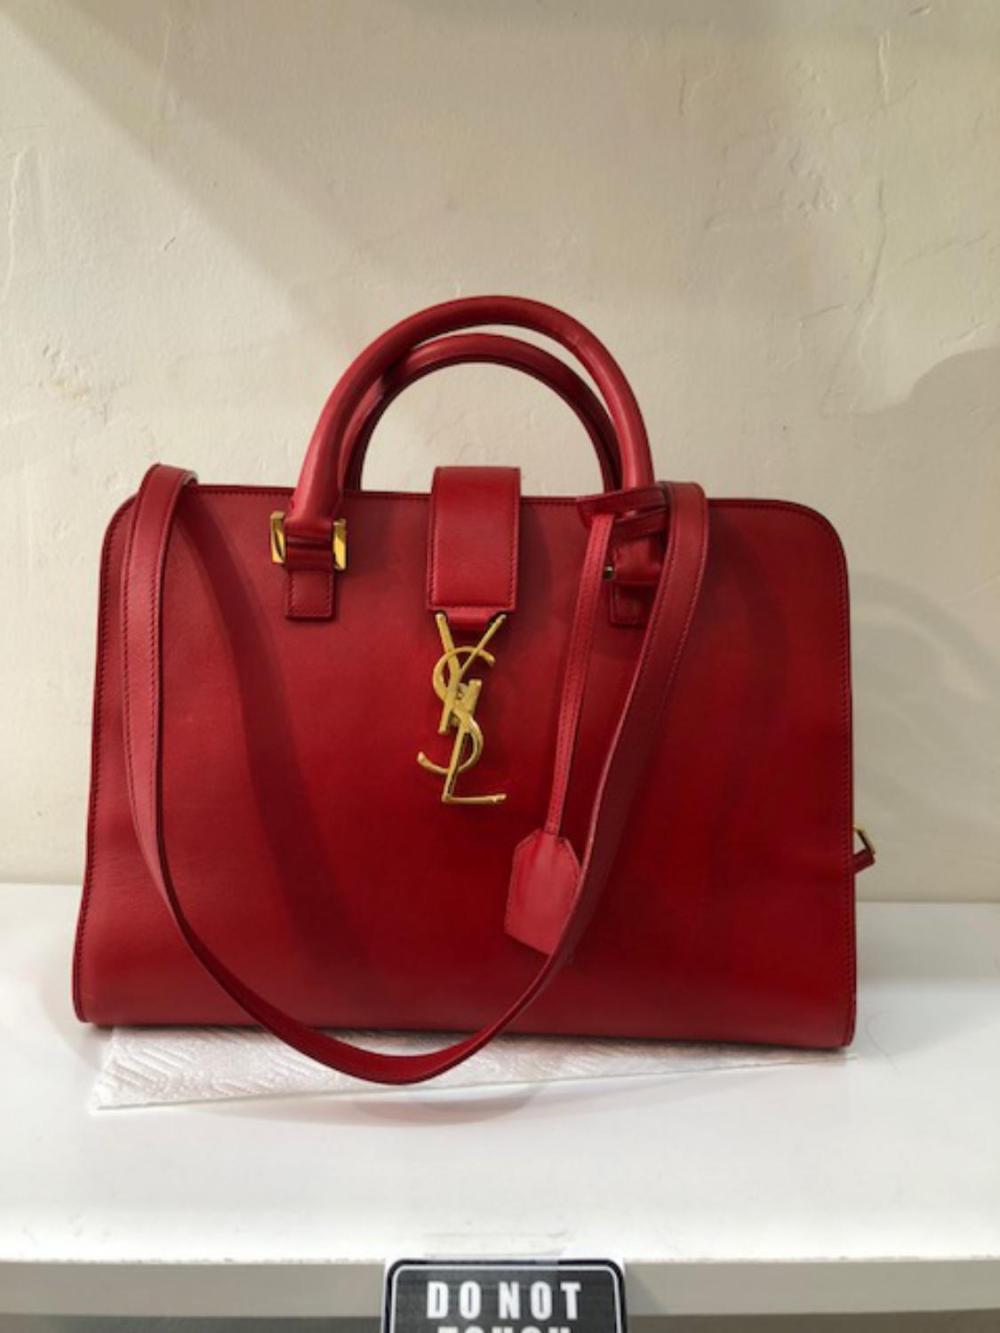 a965e46aeae2 YSL Red Leather 2018 Handbag